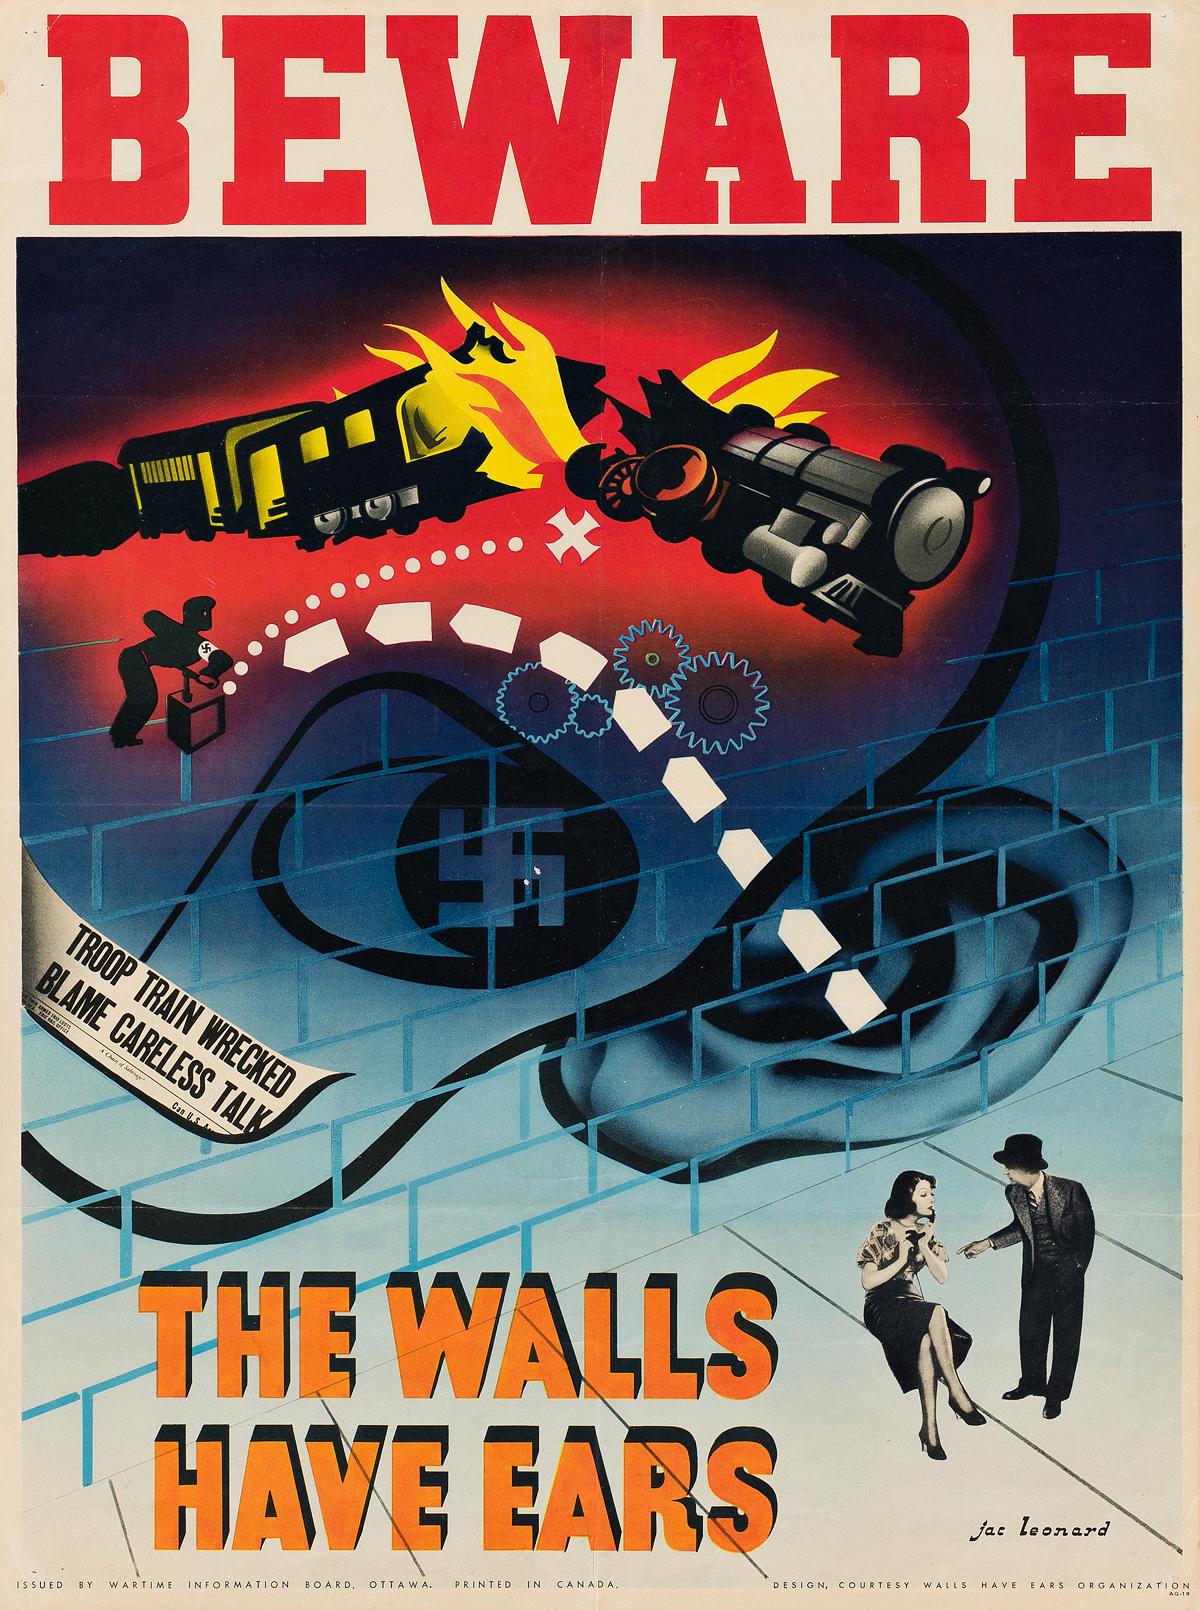 JAC-LEONARD-(1904-1980)-BEWARE--THE-WALLS-HAVE-EARS-Circa-1940-24x18-inches-62x46-cm-Wartime-Information-Board-Ottawa